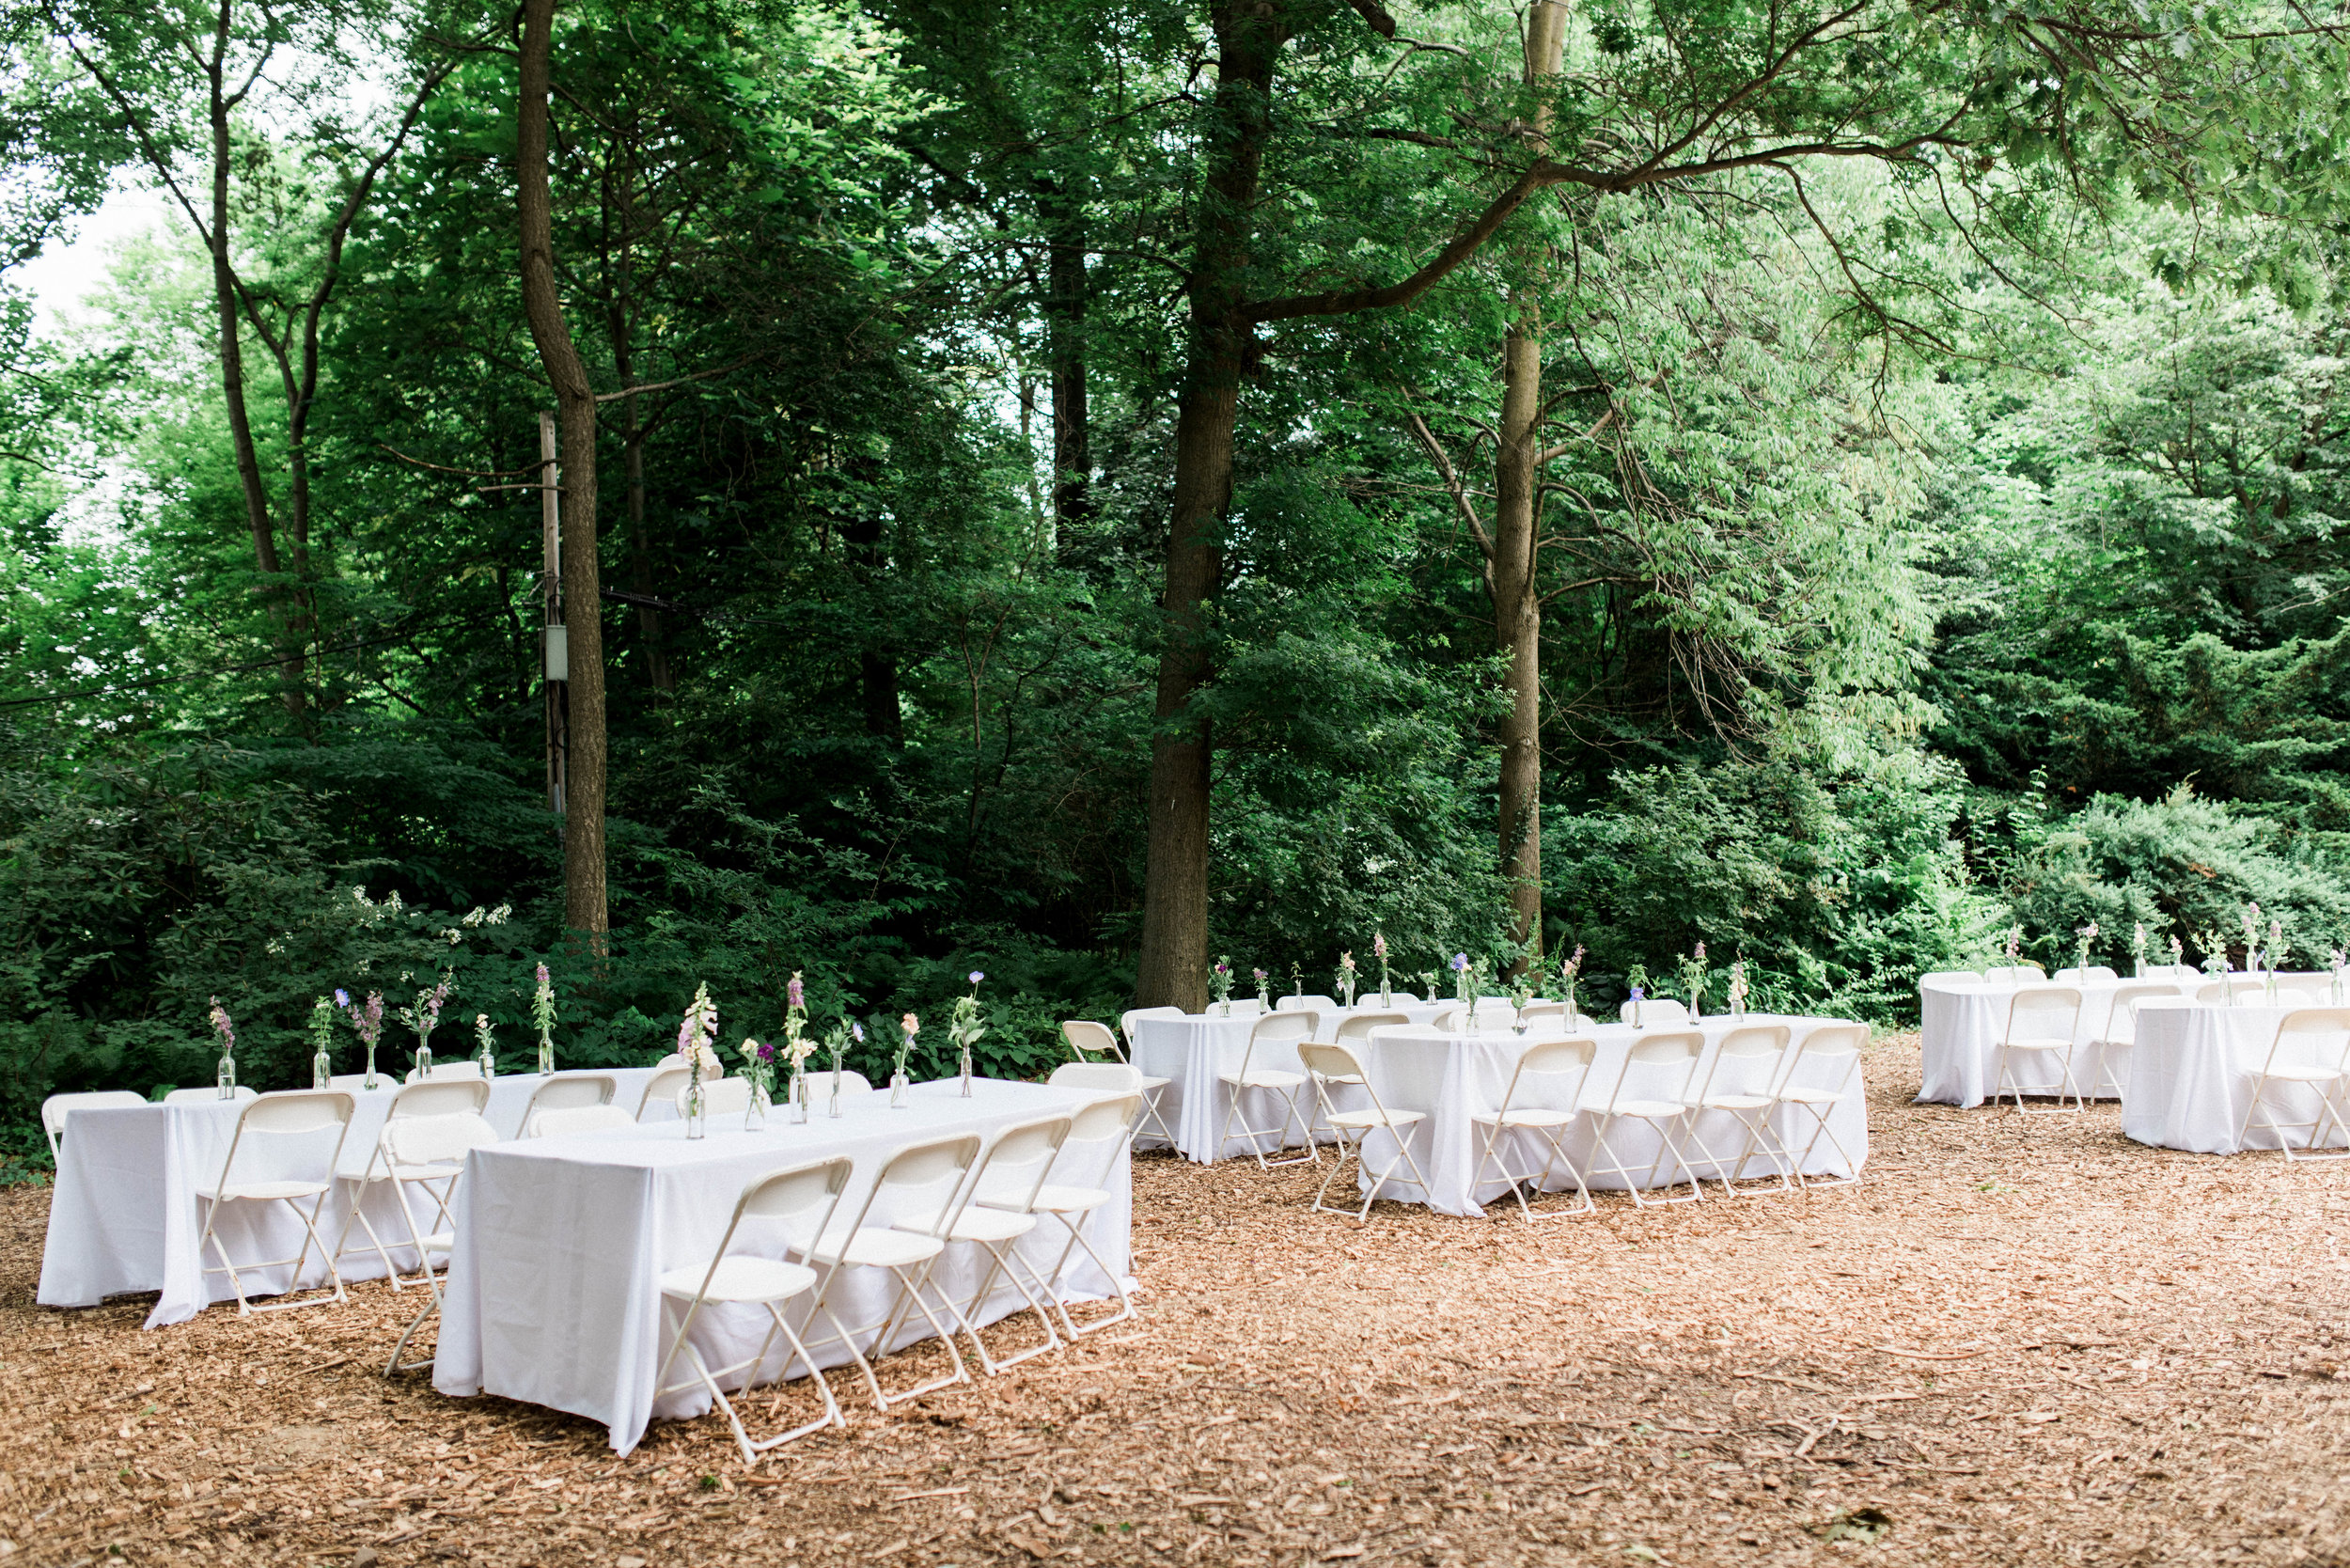 awbury-arboretum-wedding-DIY-boho-summer-haley-richter-photography-016.jpg